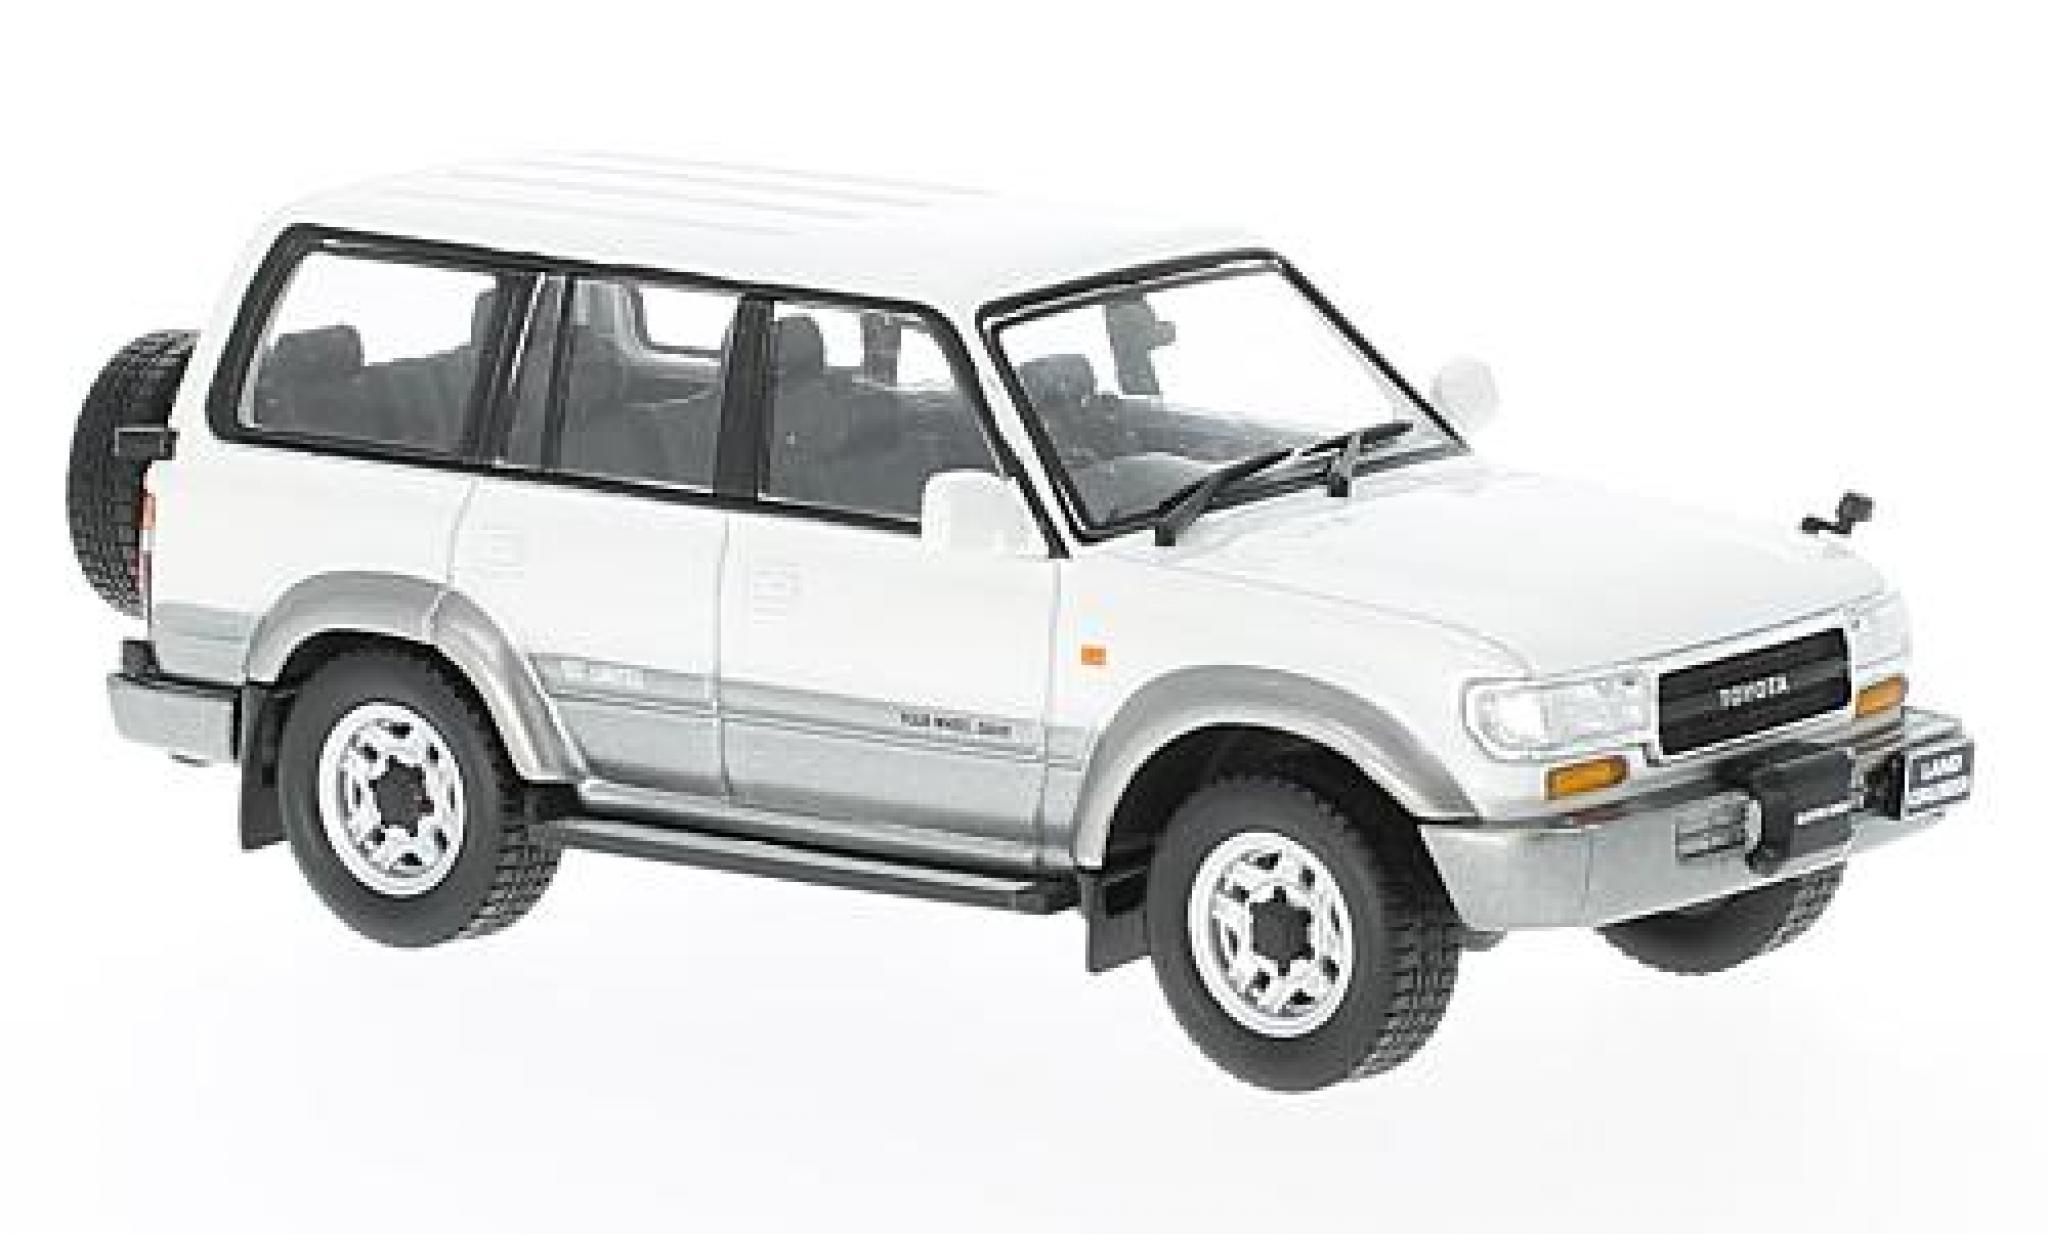 Toyota Land Cruiser 1/43 First 43 Models LC80 metallise blanche/grise RHD 1992